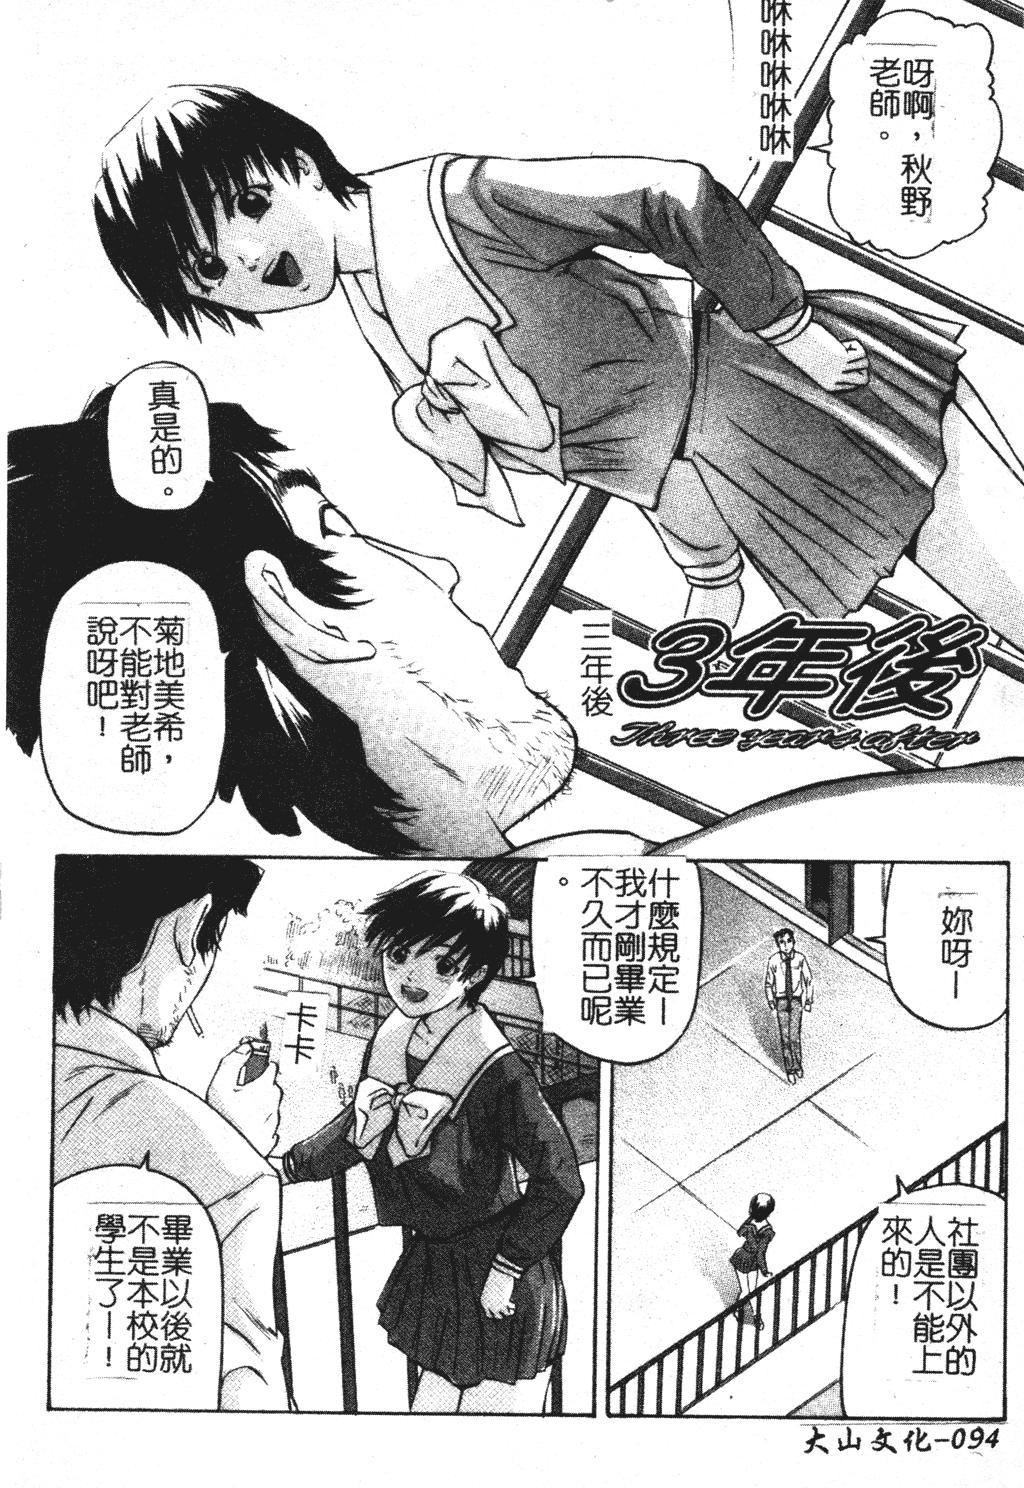 Ikenai Asobi 94